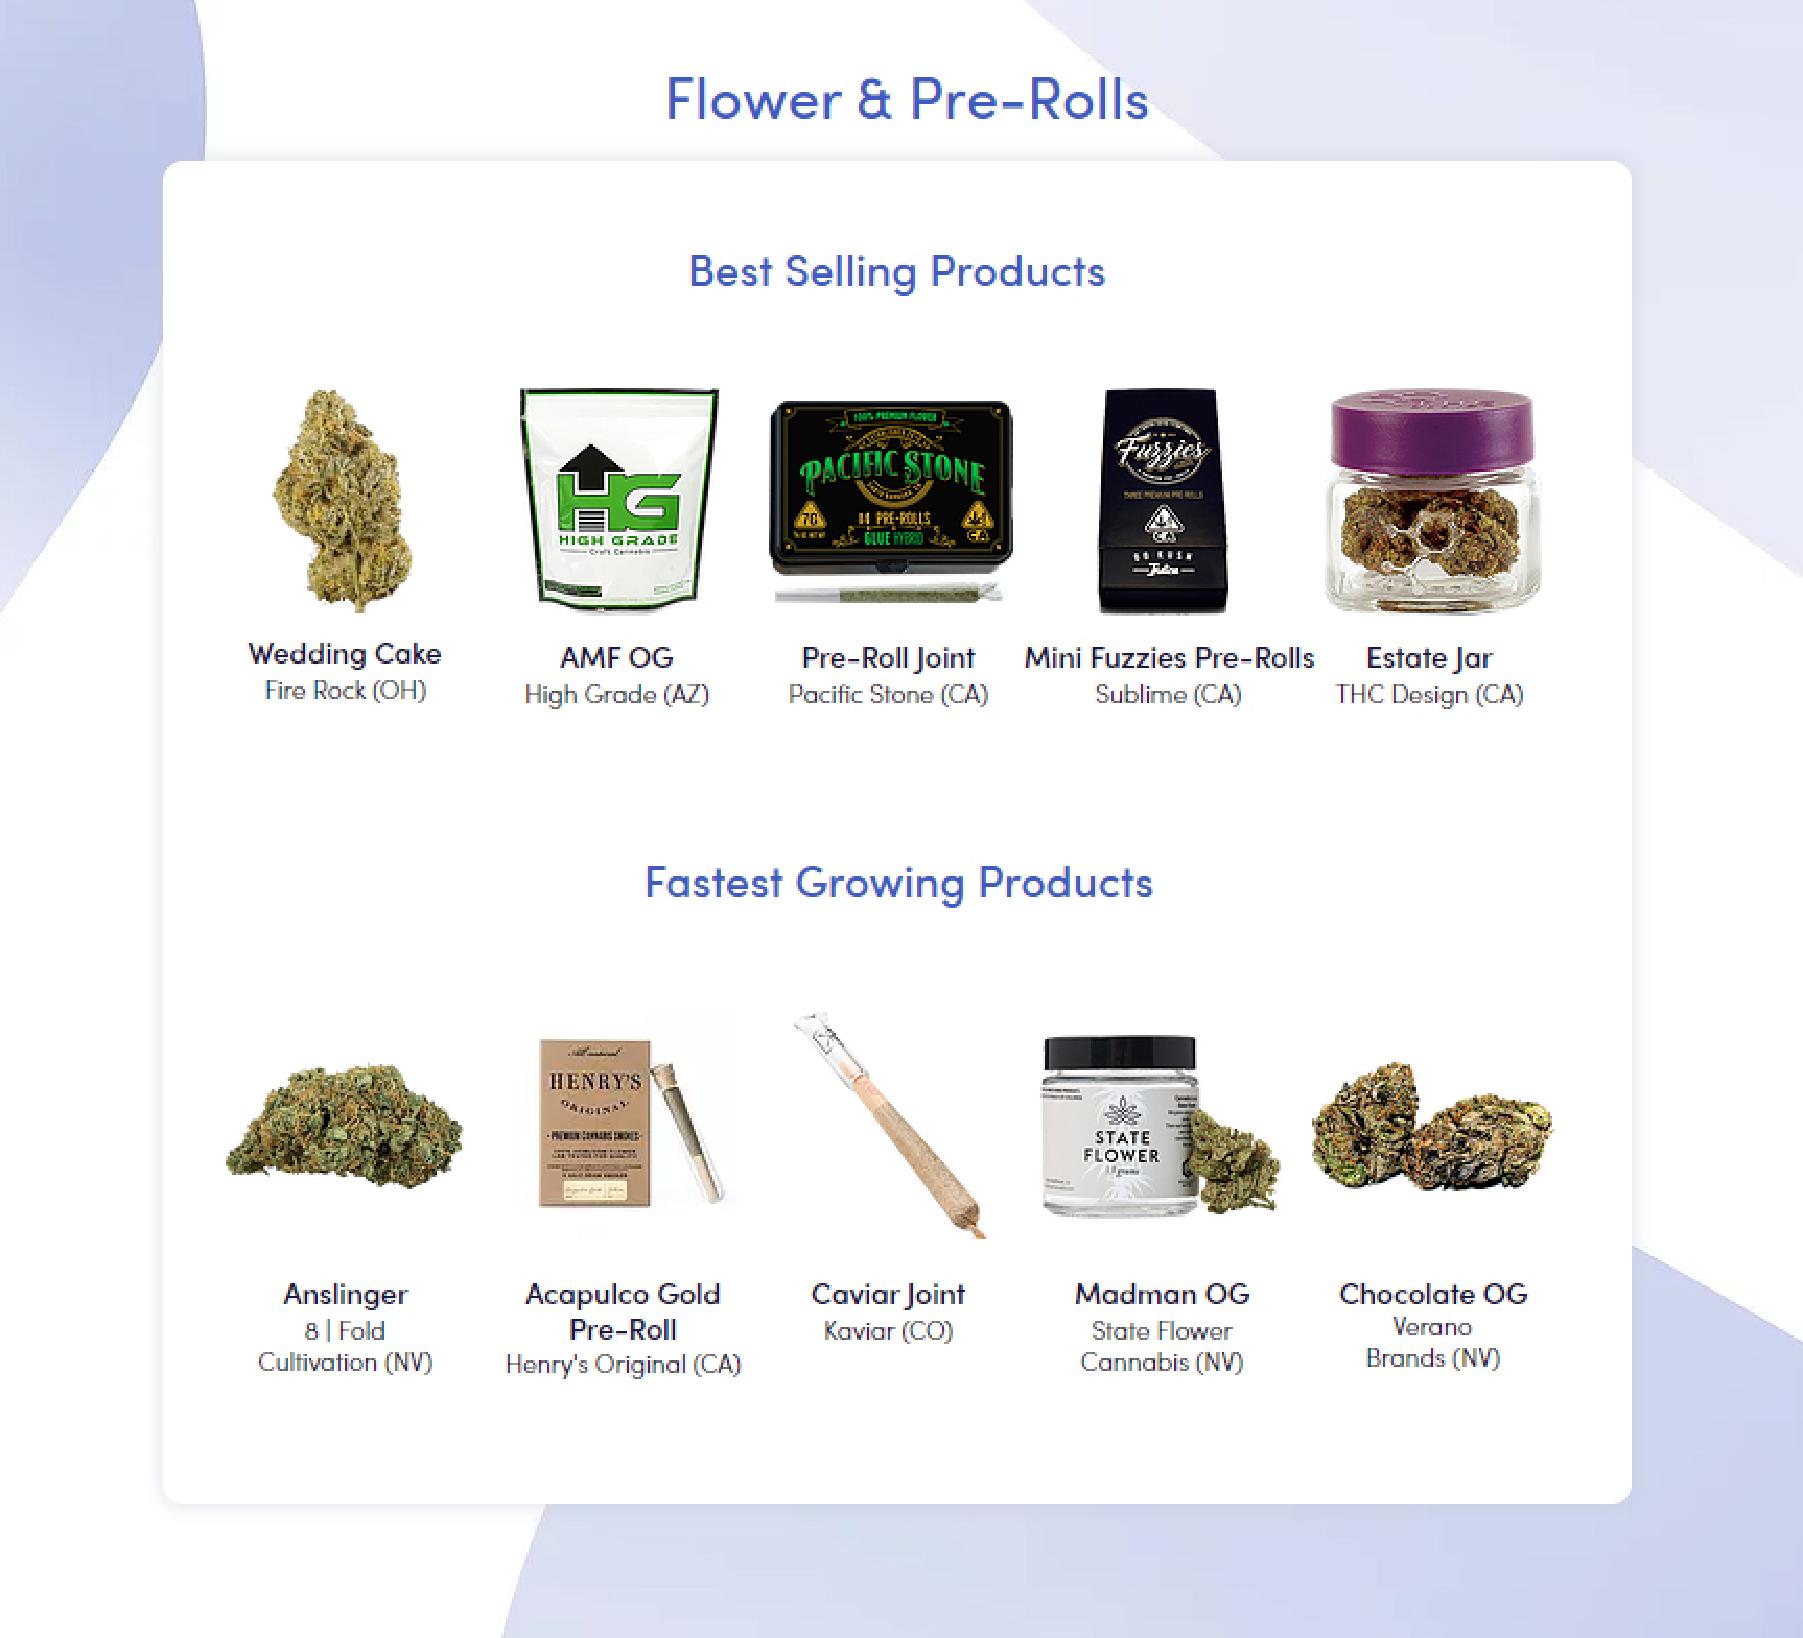 Cannabis Plant Tissue Culture by THC Design